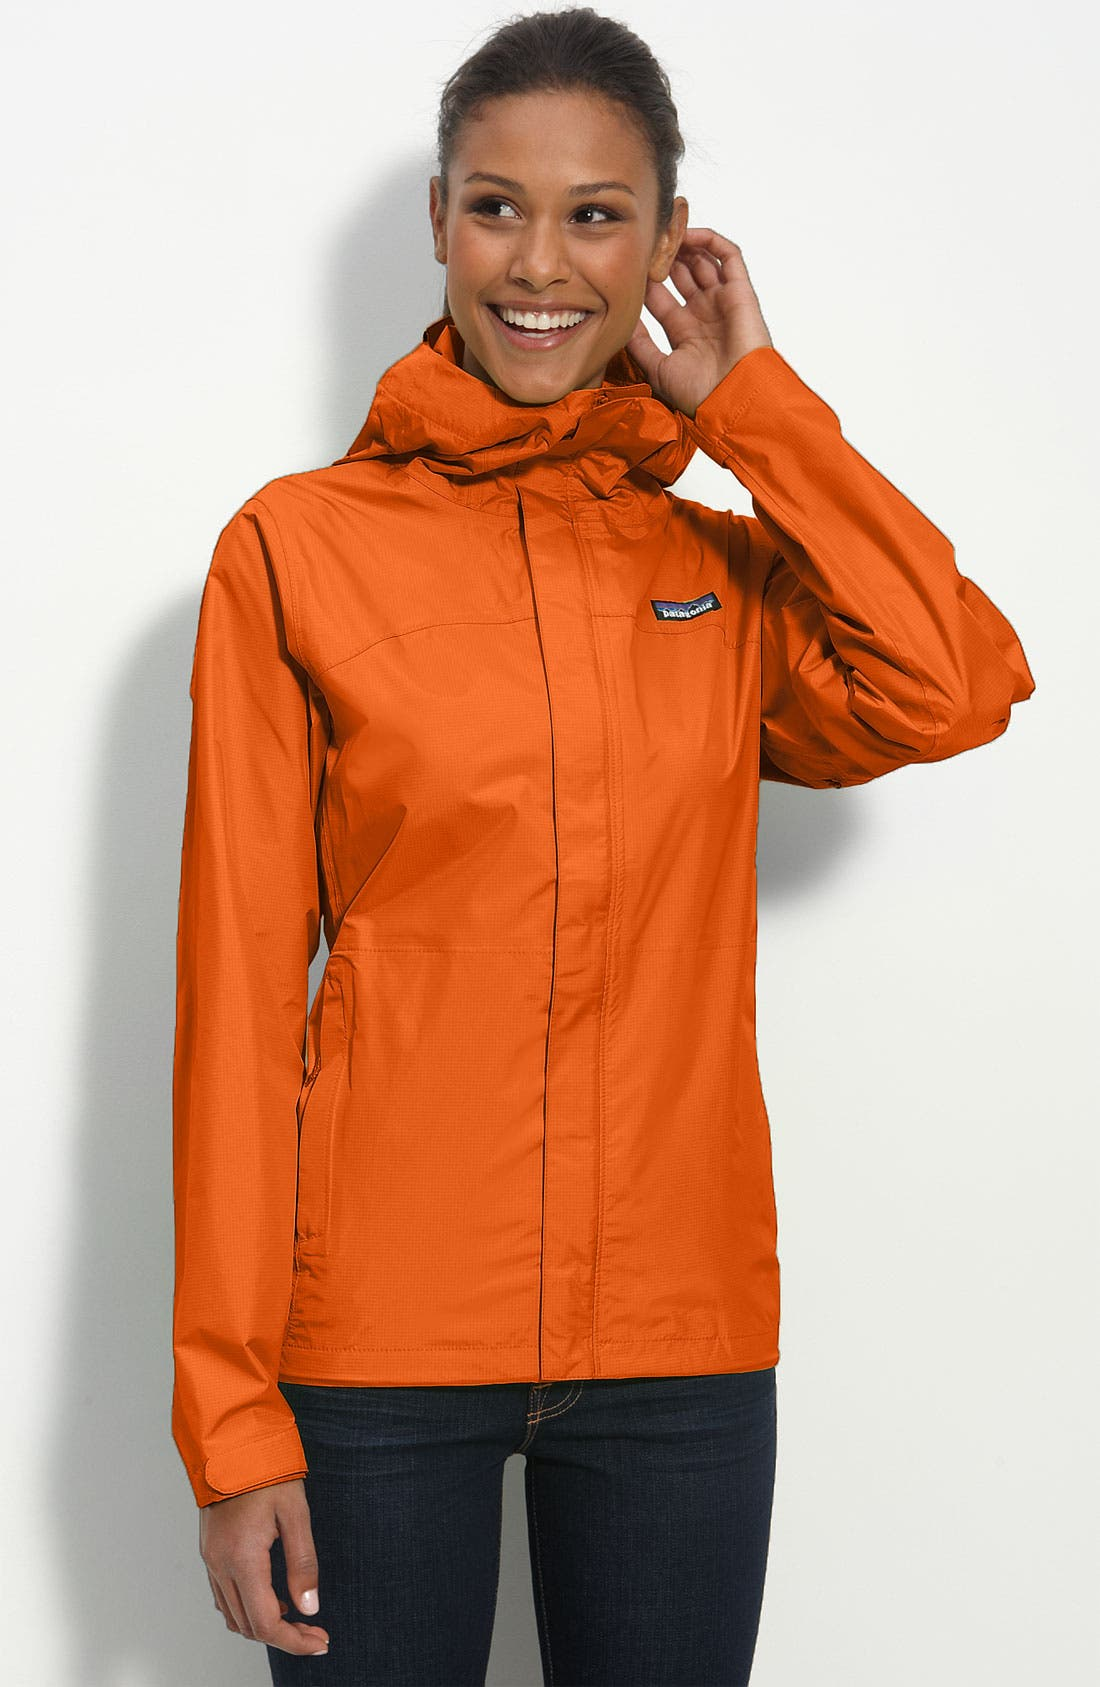 Alternate Image 1 Selected - Patagonia 'Torrentshell' Jacket